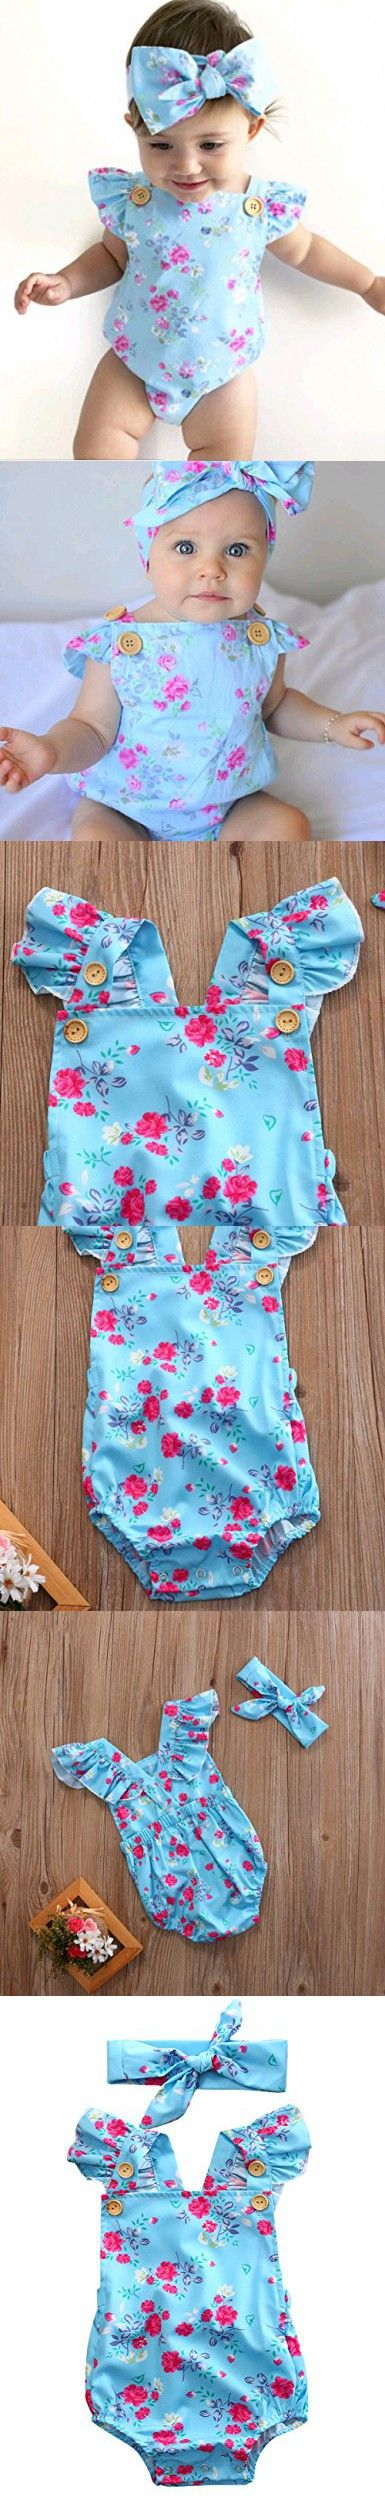 Baby Girls' Full Flower Print Buttons Ruffles Romper Bodysuit with Headband (70(0-6M), Blue(with headband))